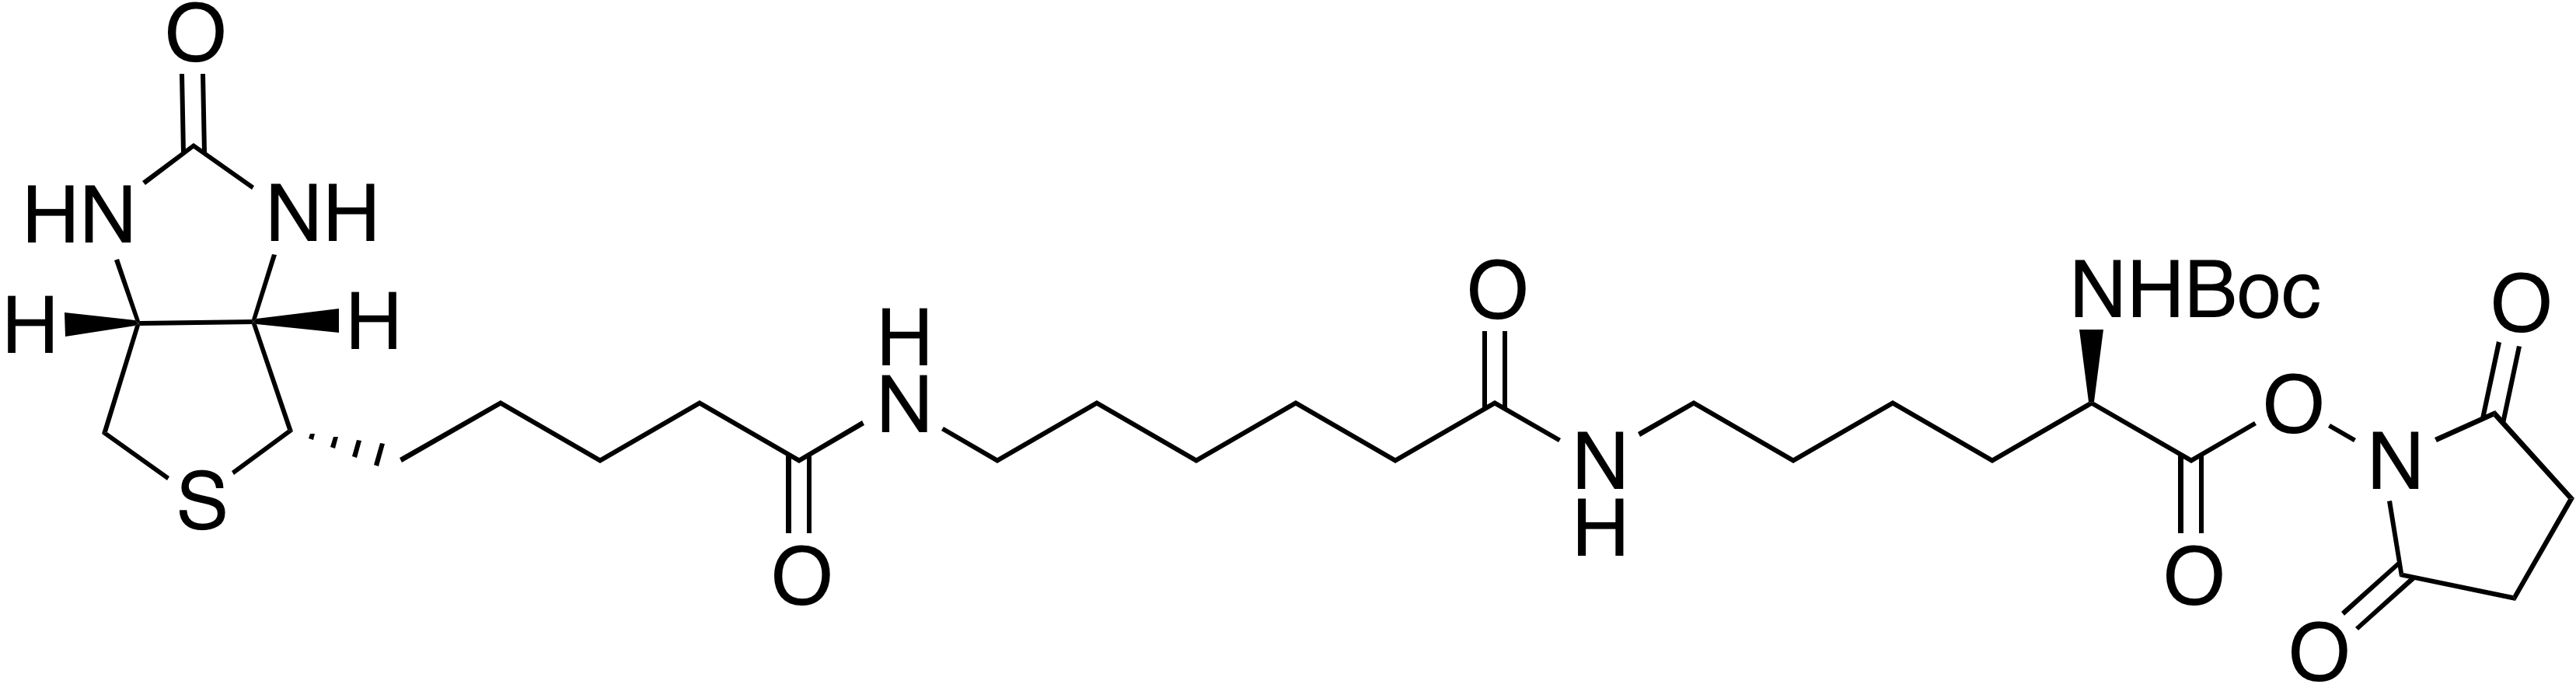 N2-t-Boc-N6-(biotinamido-6-N-caproylamido)-D-lysine N-hydroxysuccinimide ester